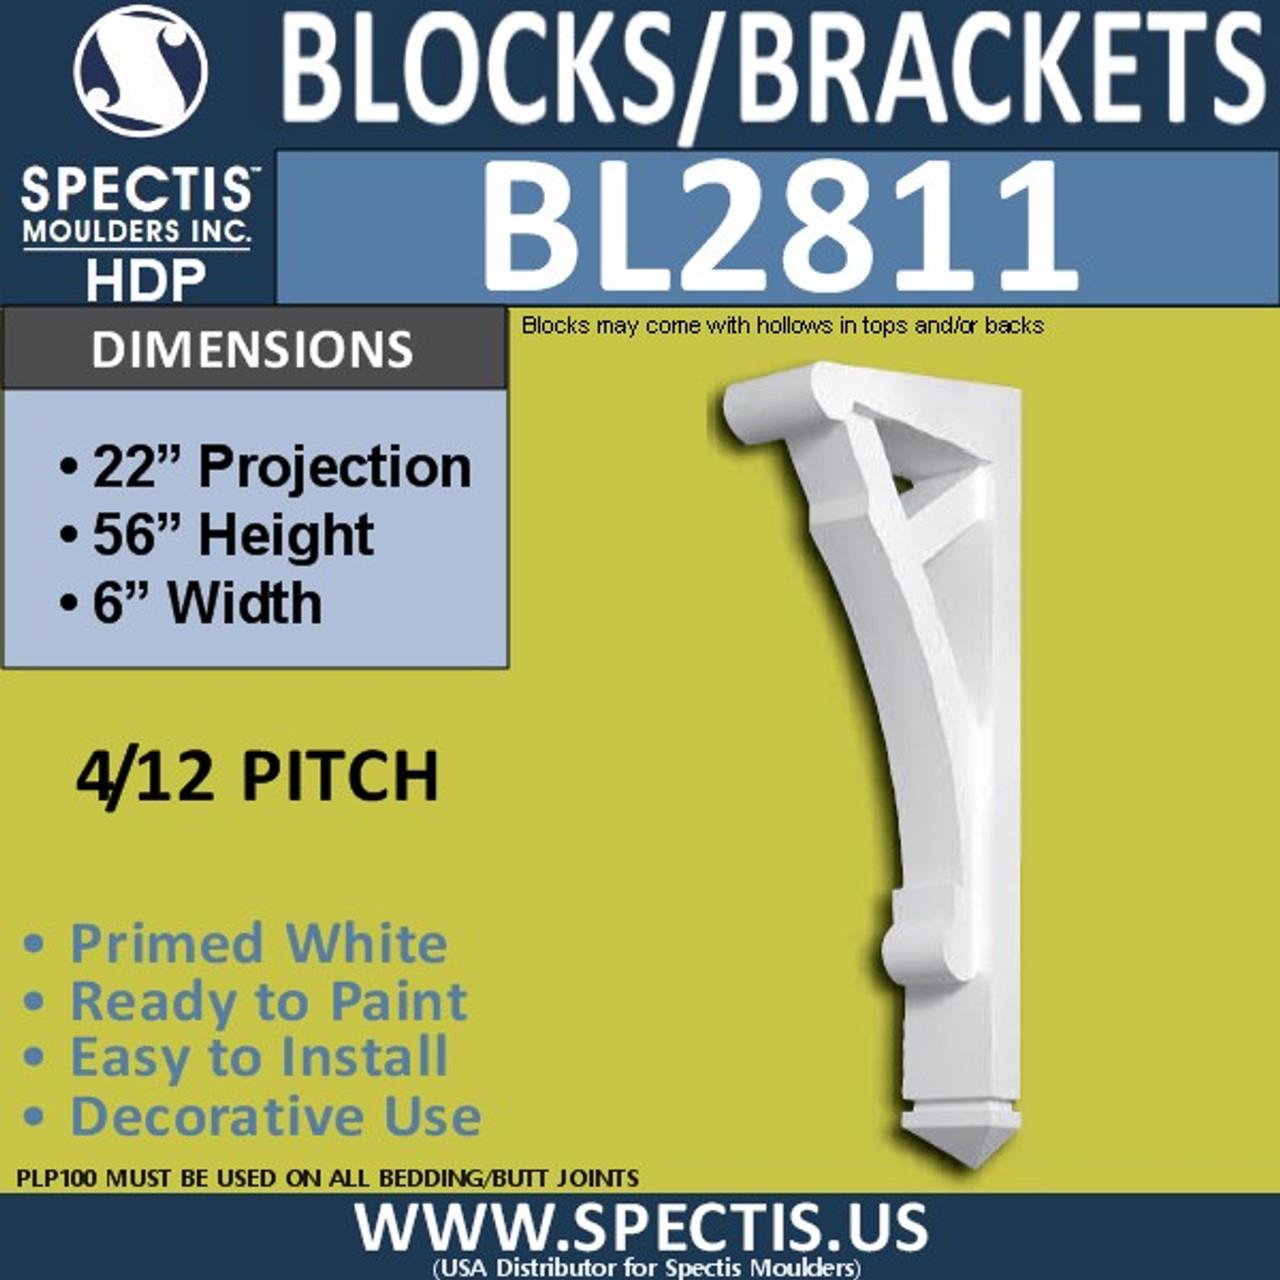 "BL2811 Eave Block or Bracket 6""W x 56""H x 22"" P"